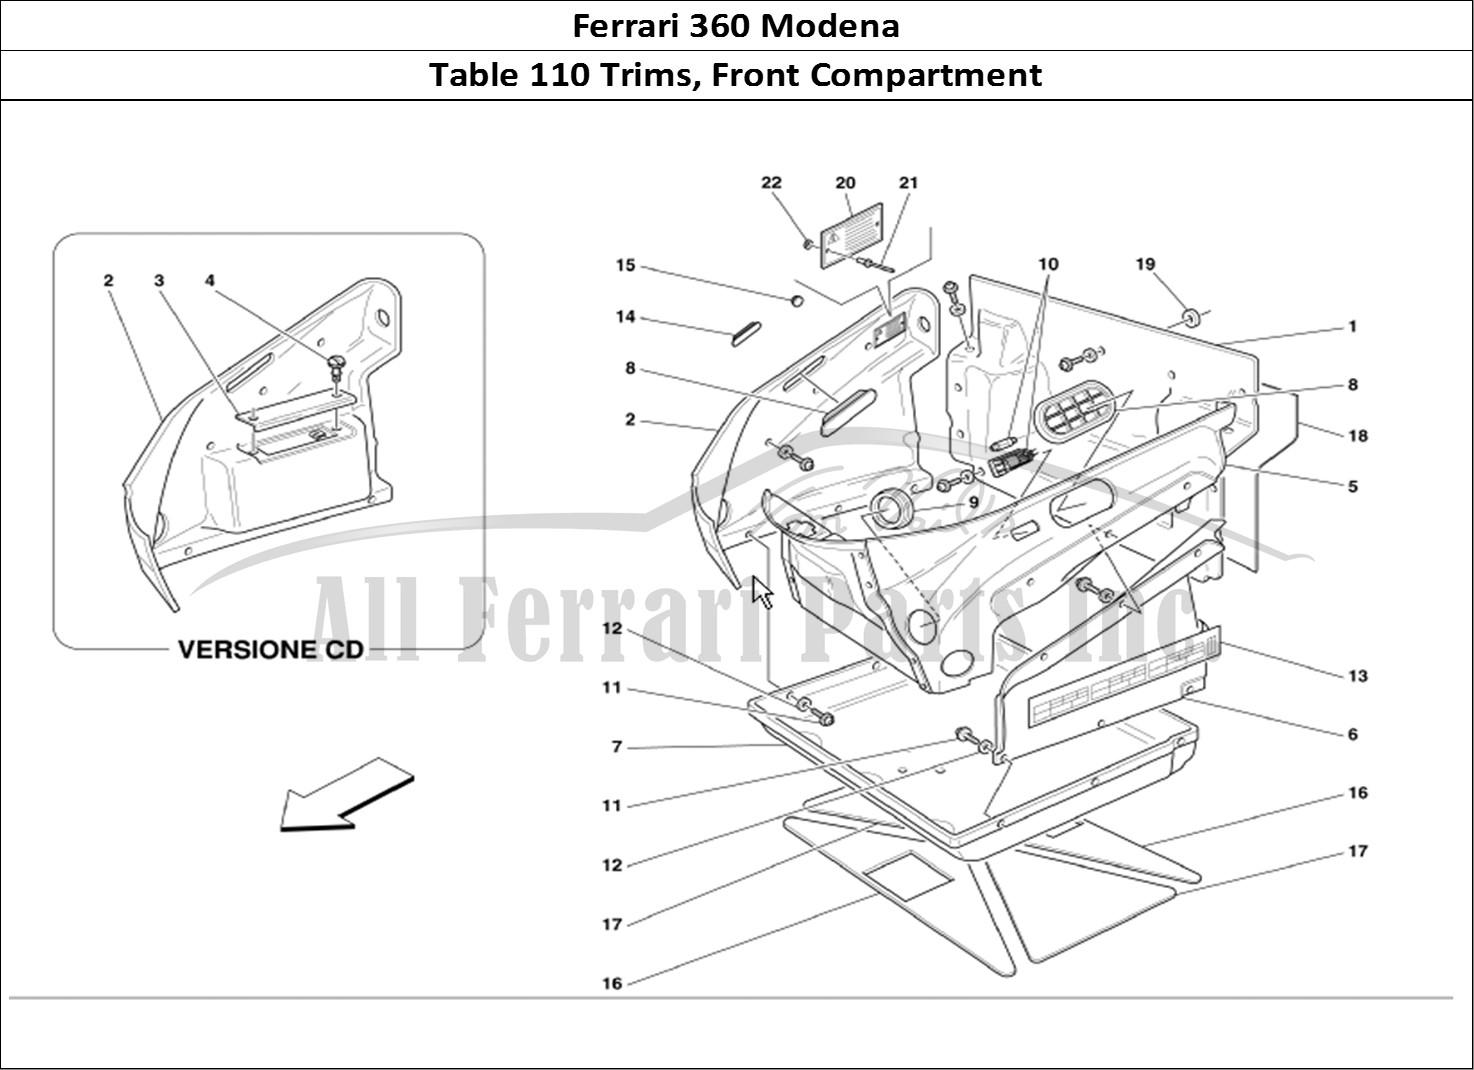 buy original ferrari 360 modena 110 trims  front compartment ferrari parts  spares  accessories